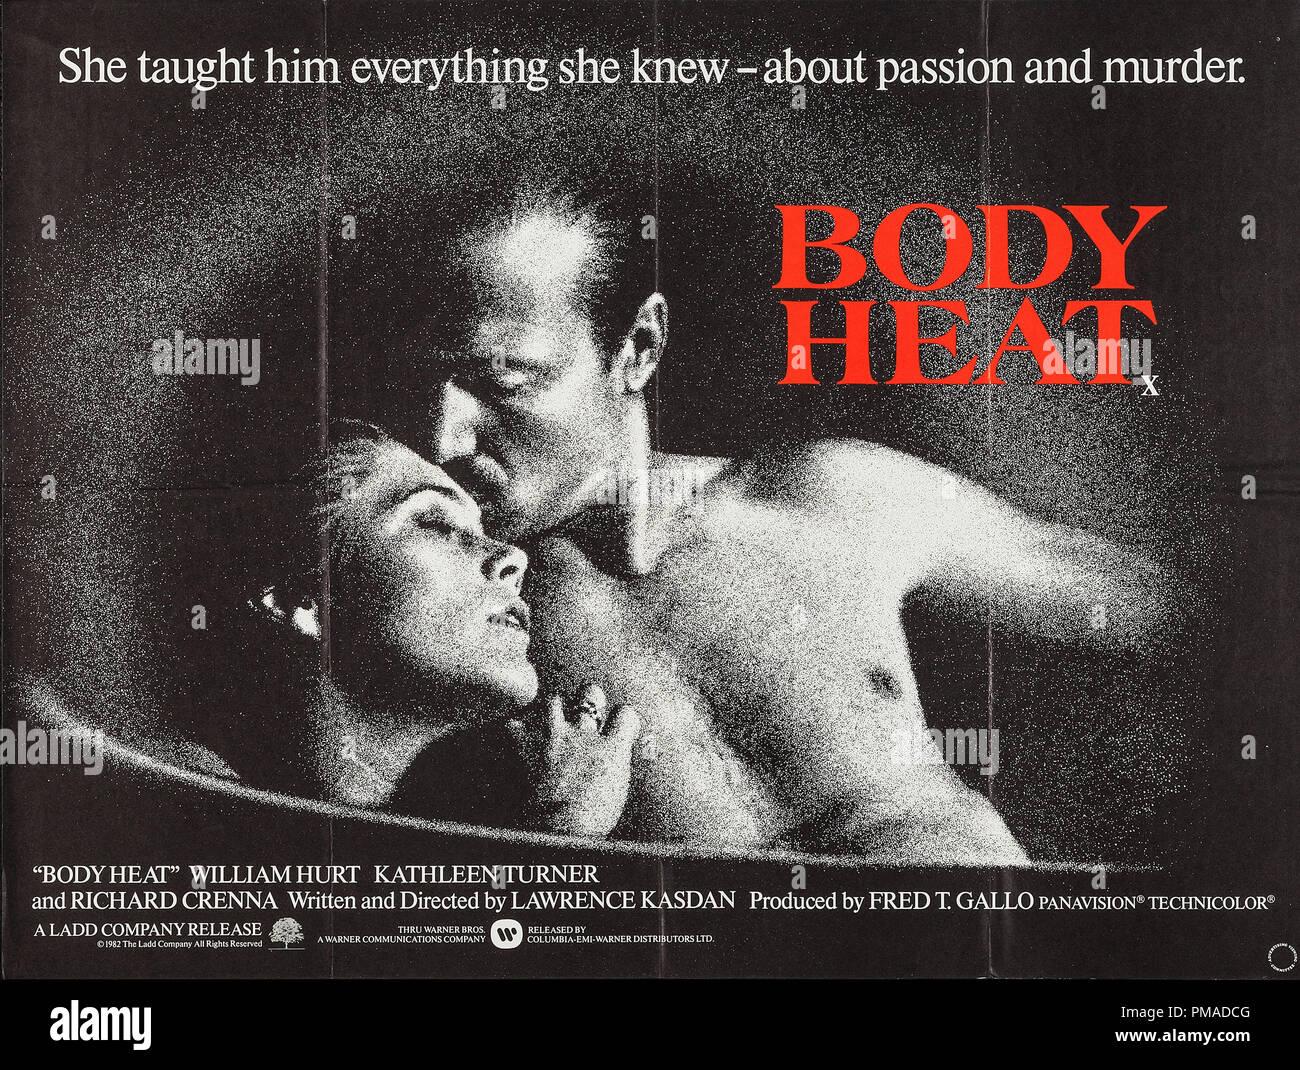 Body Heat Poster Stock Photos & Body Heat Poster Stock